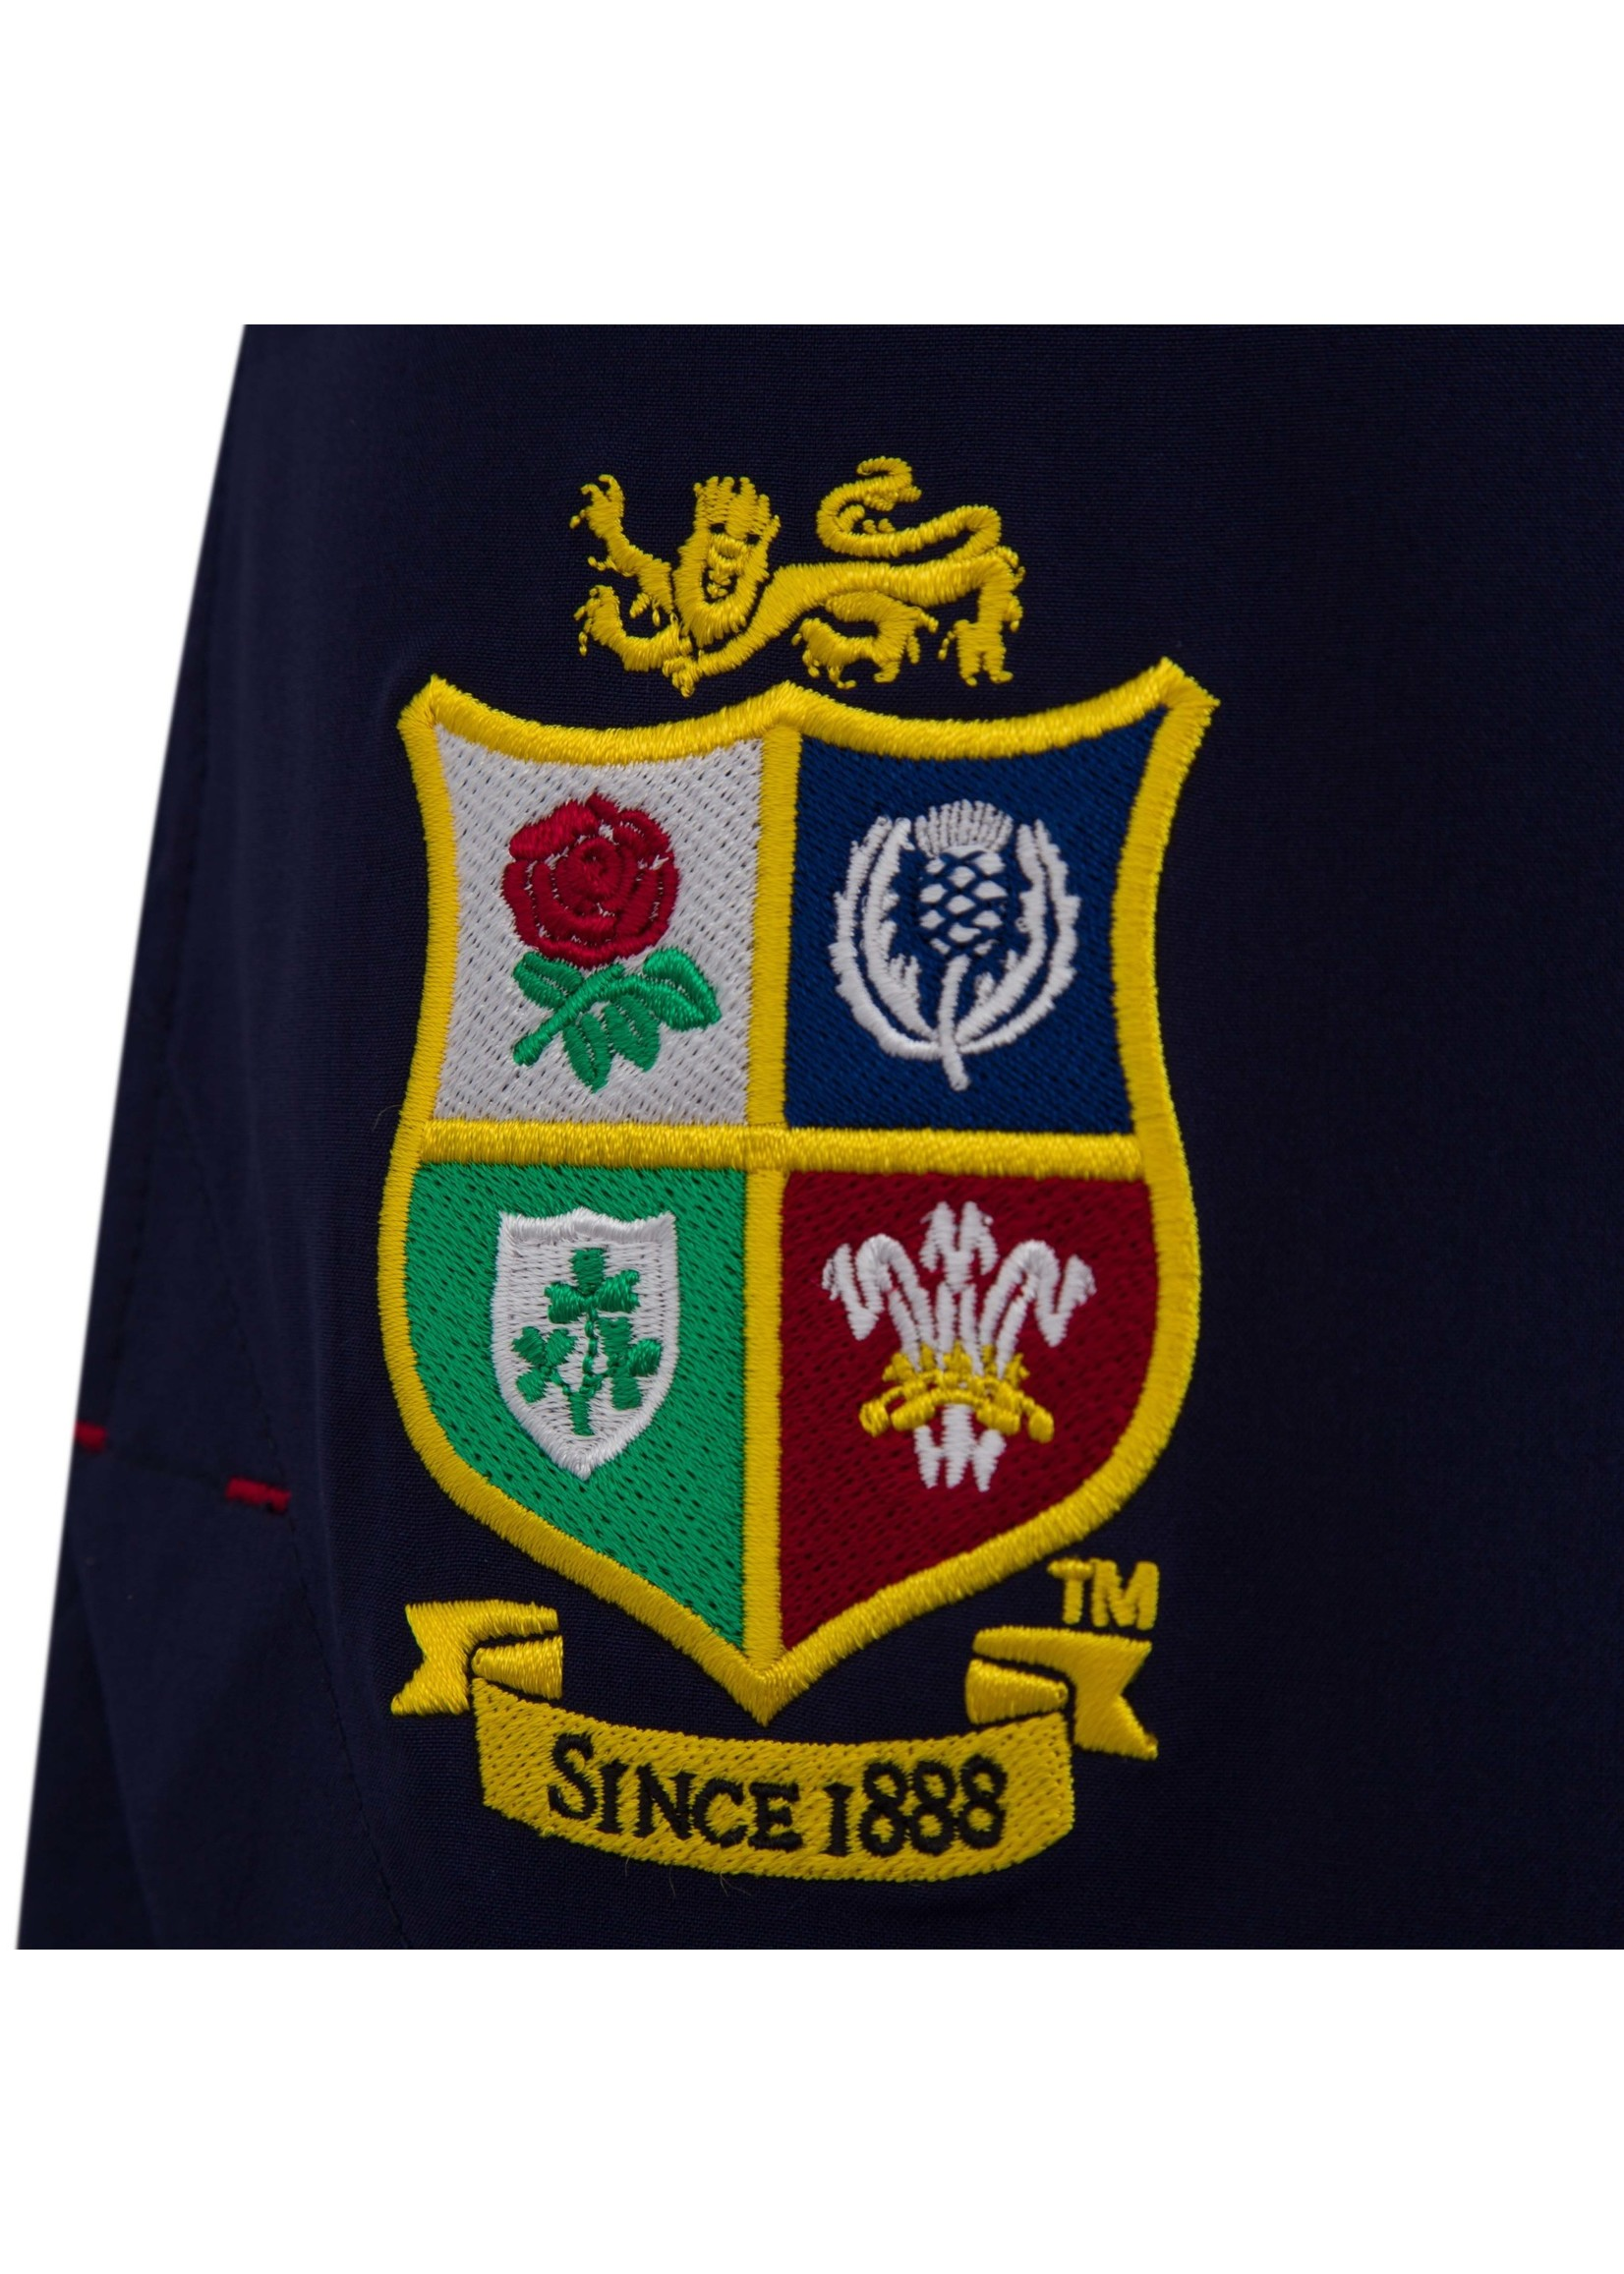 "Canterbury British & Irish Lions - Mens 8"" Woven Gym Short (2021) - Blue"